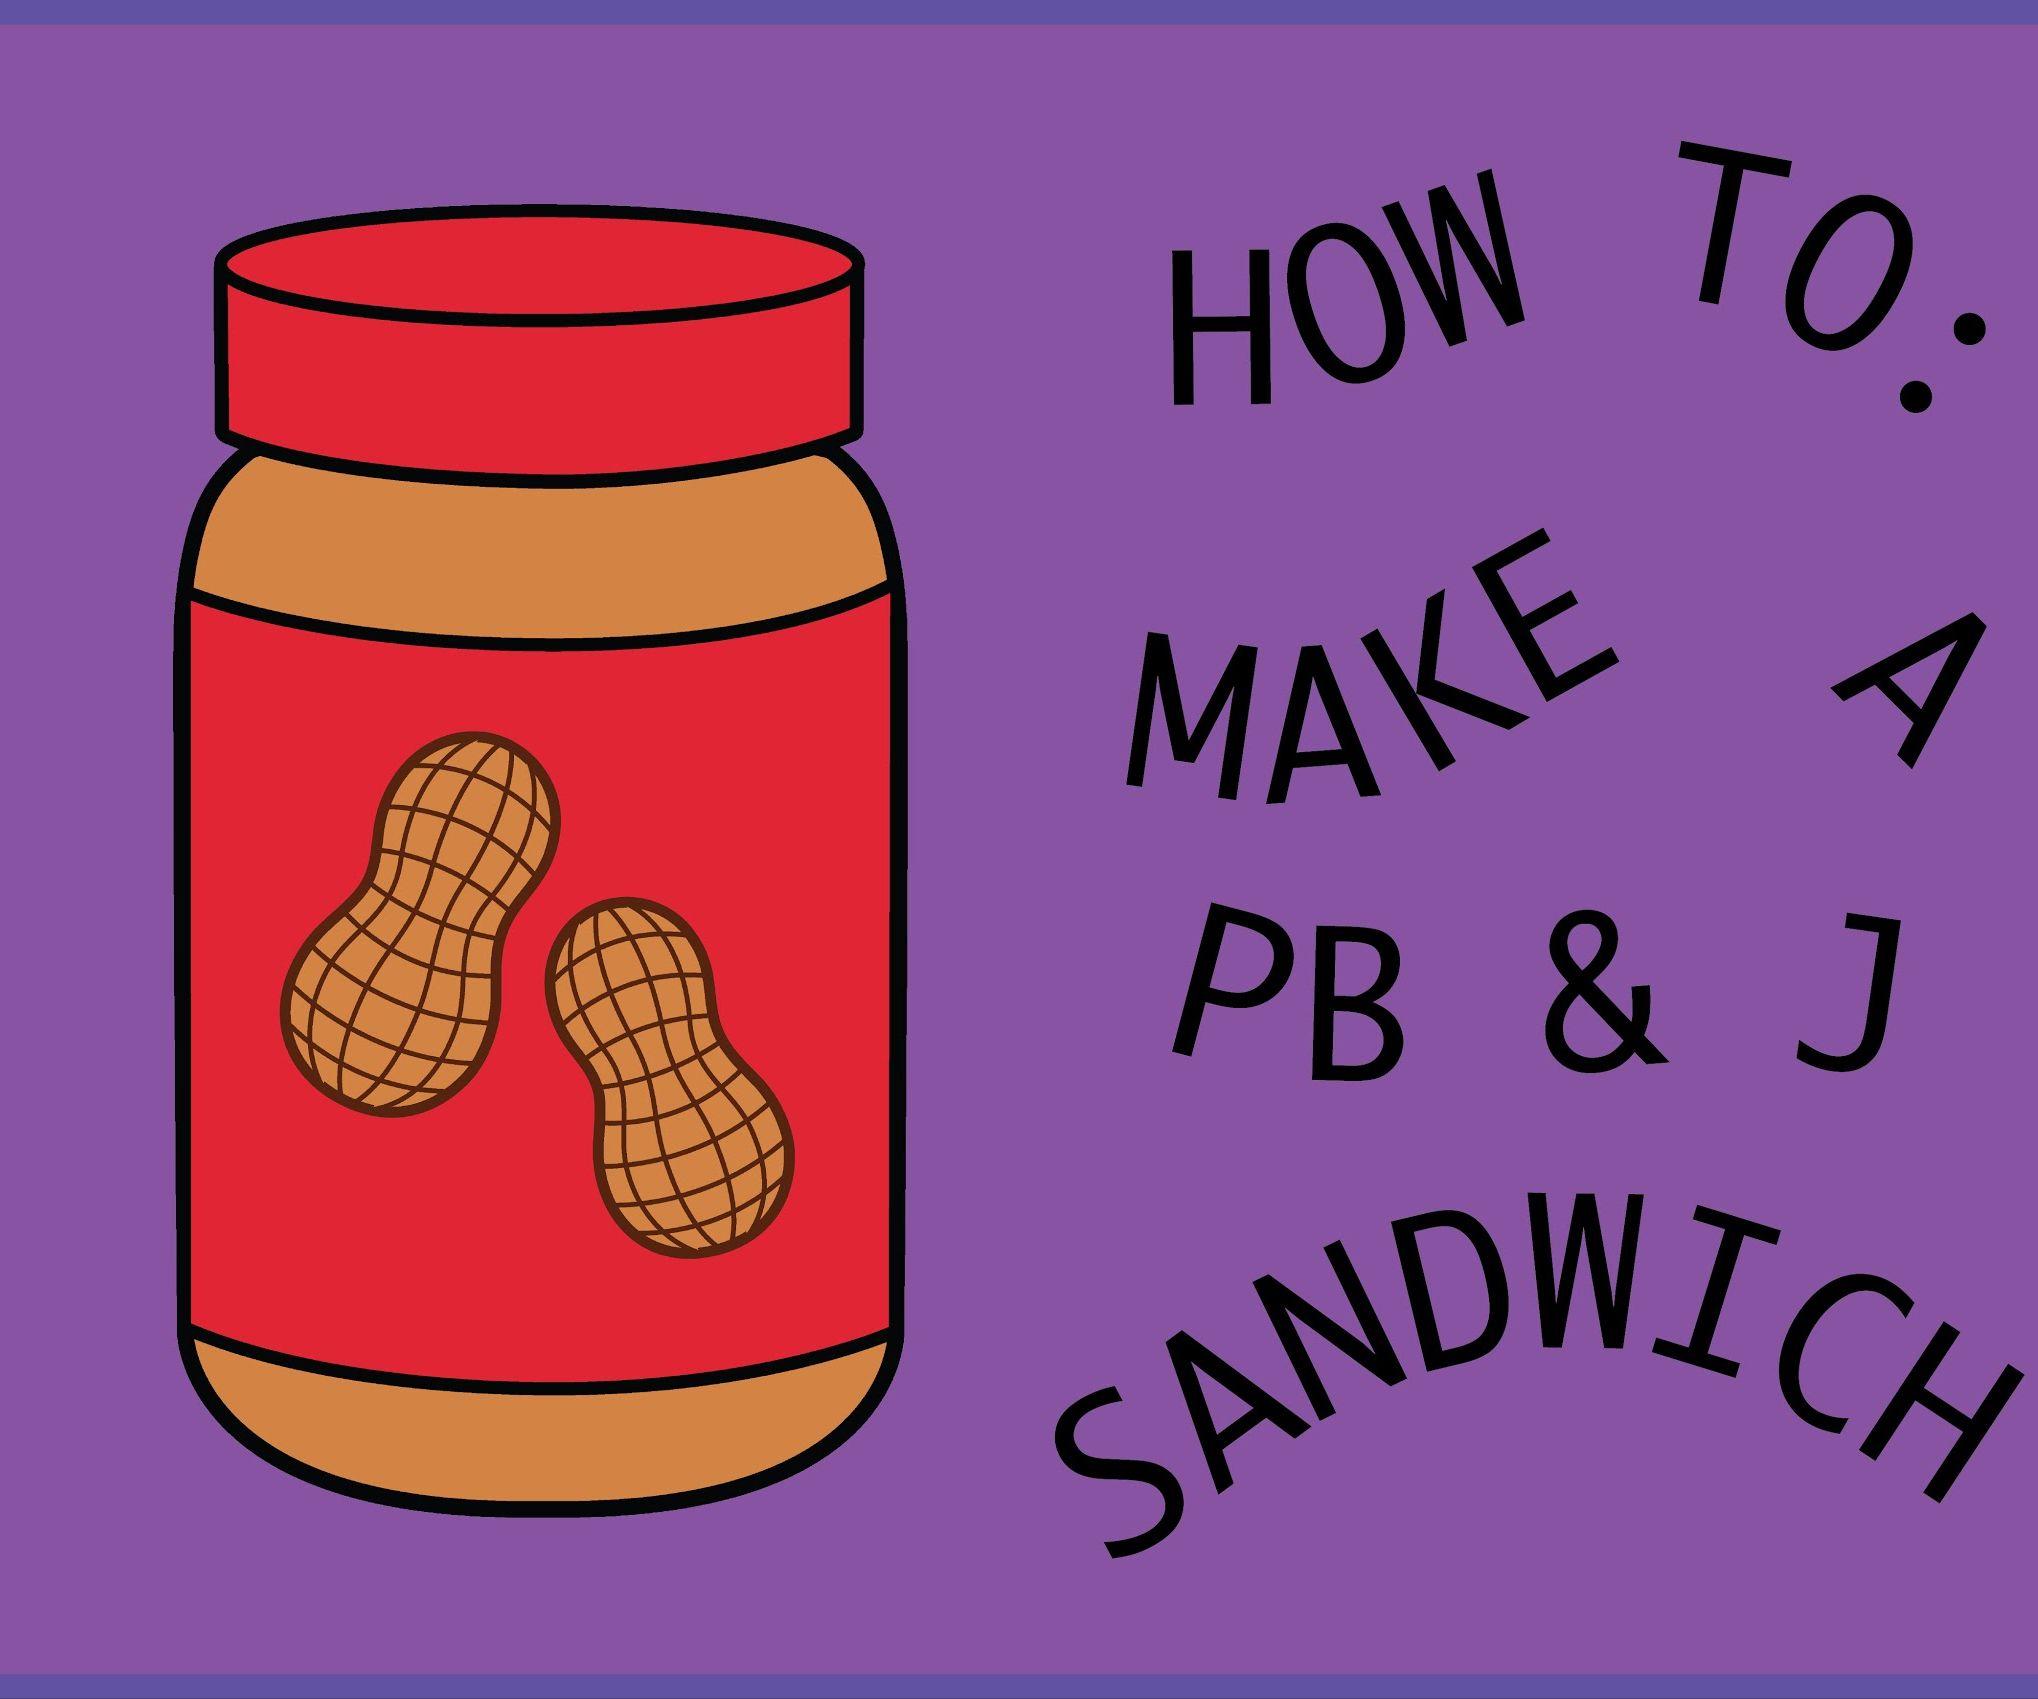 Making peanut butter sandwich clipart clip art How to Make a Peanut Butter and Jelly Sandwich!: 11 Steps clip art